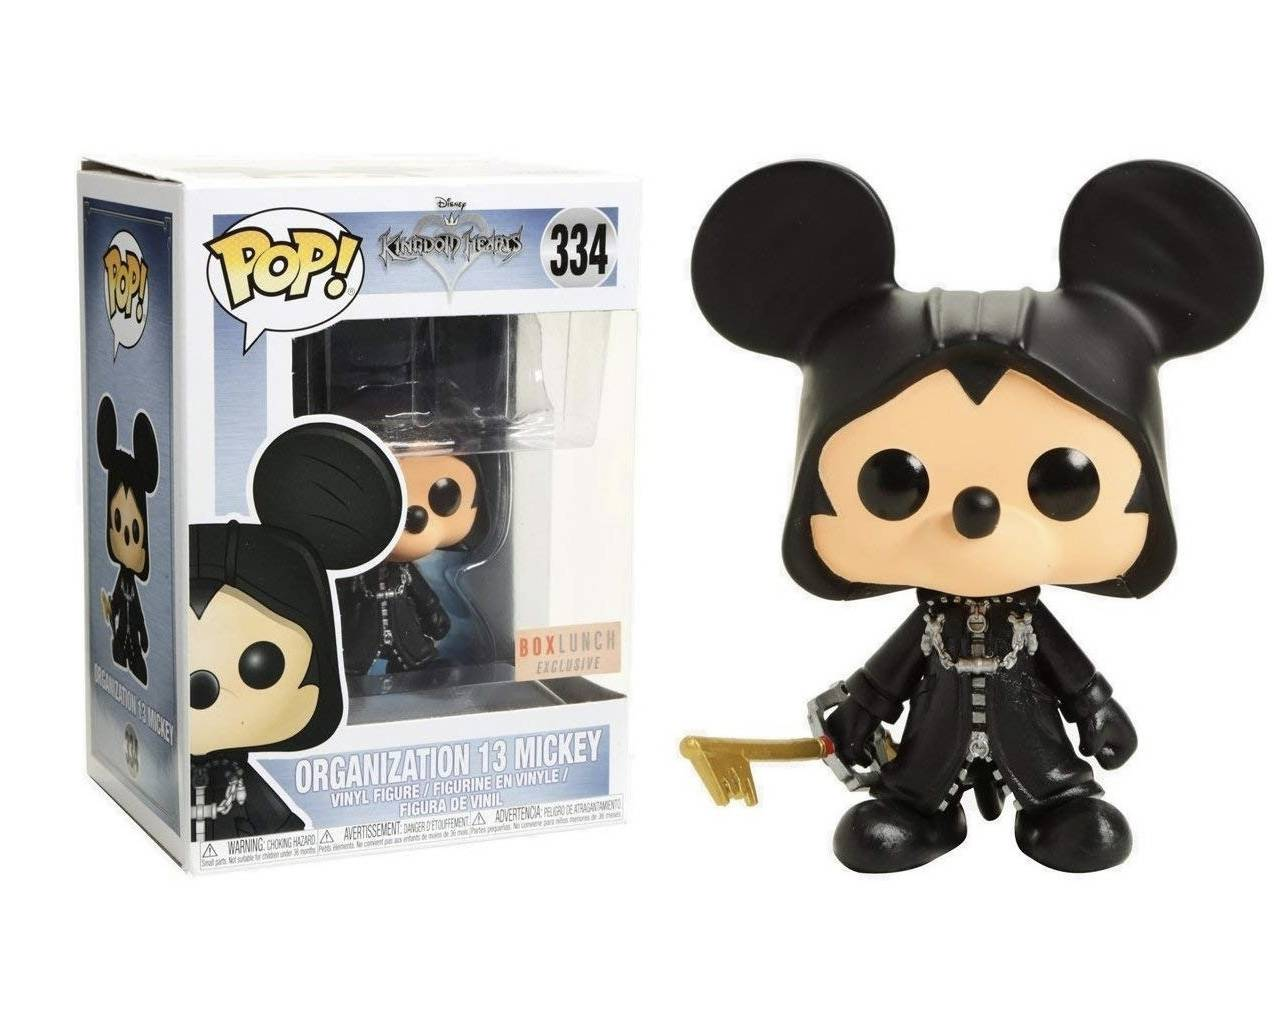 Organization 13 Mickey Pop! Vinyl